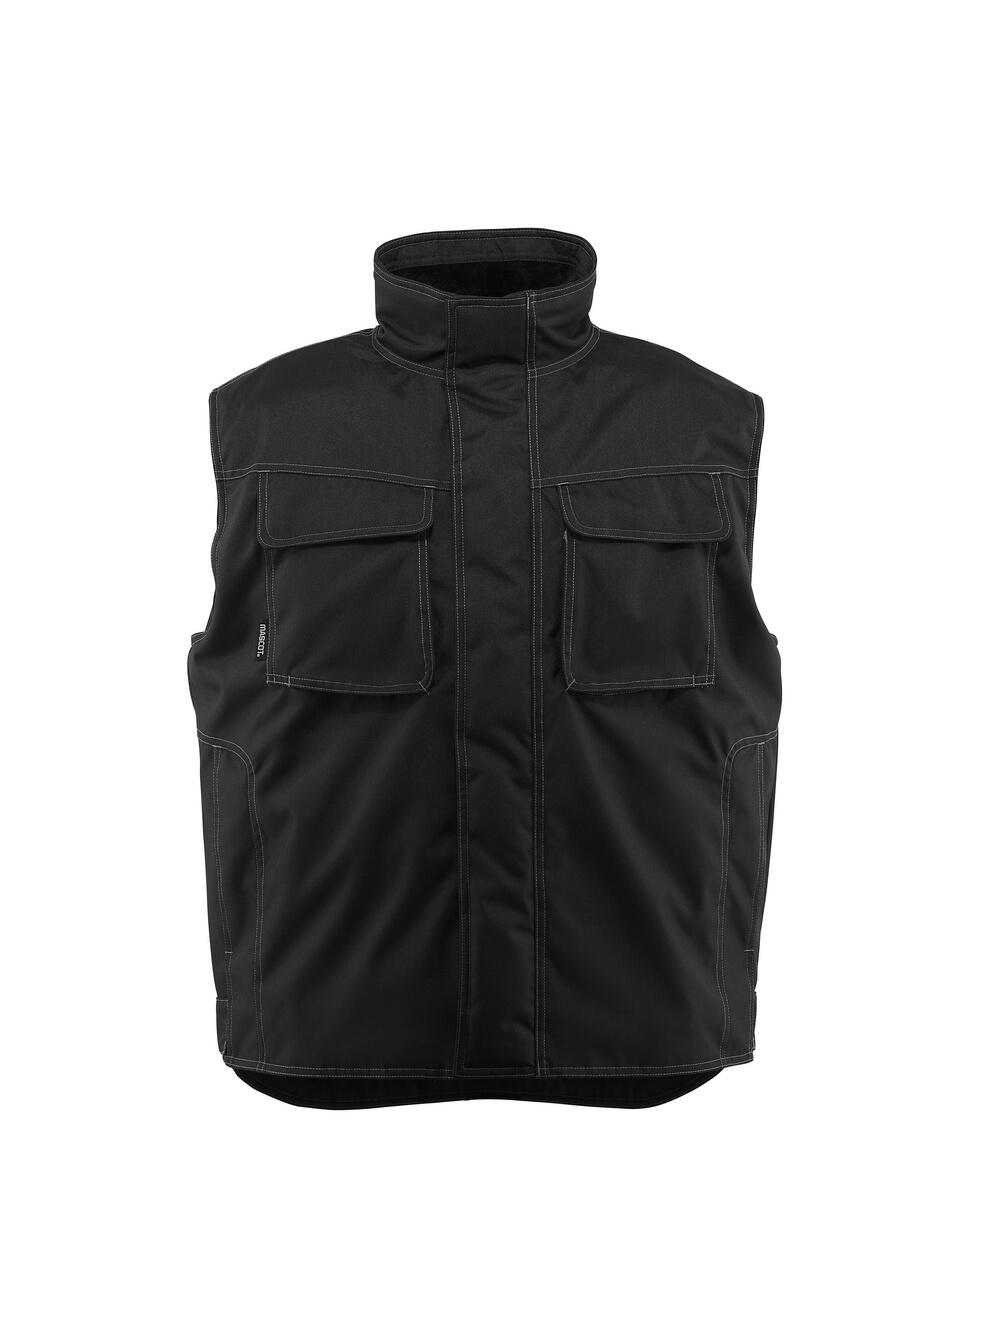 10054-194-09 Winter Gilet - black